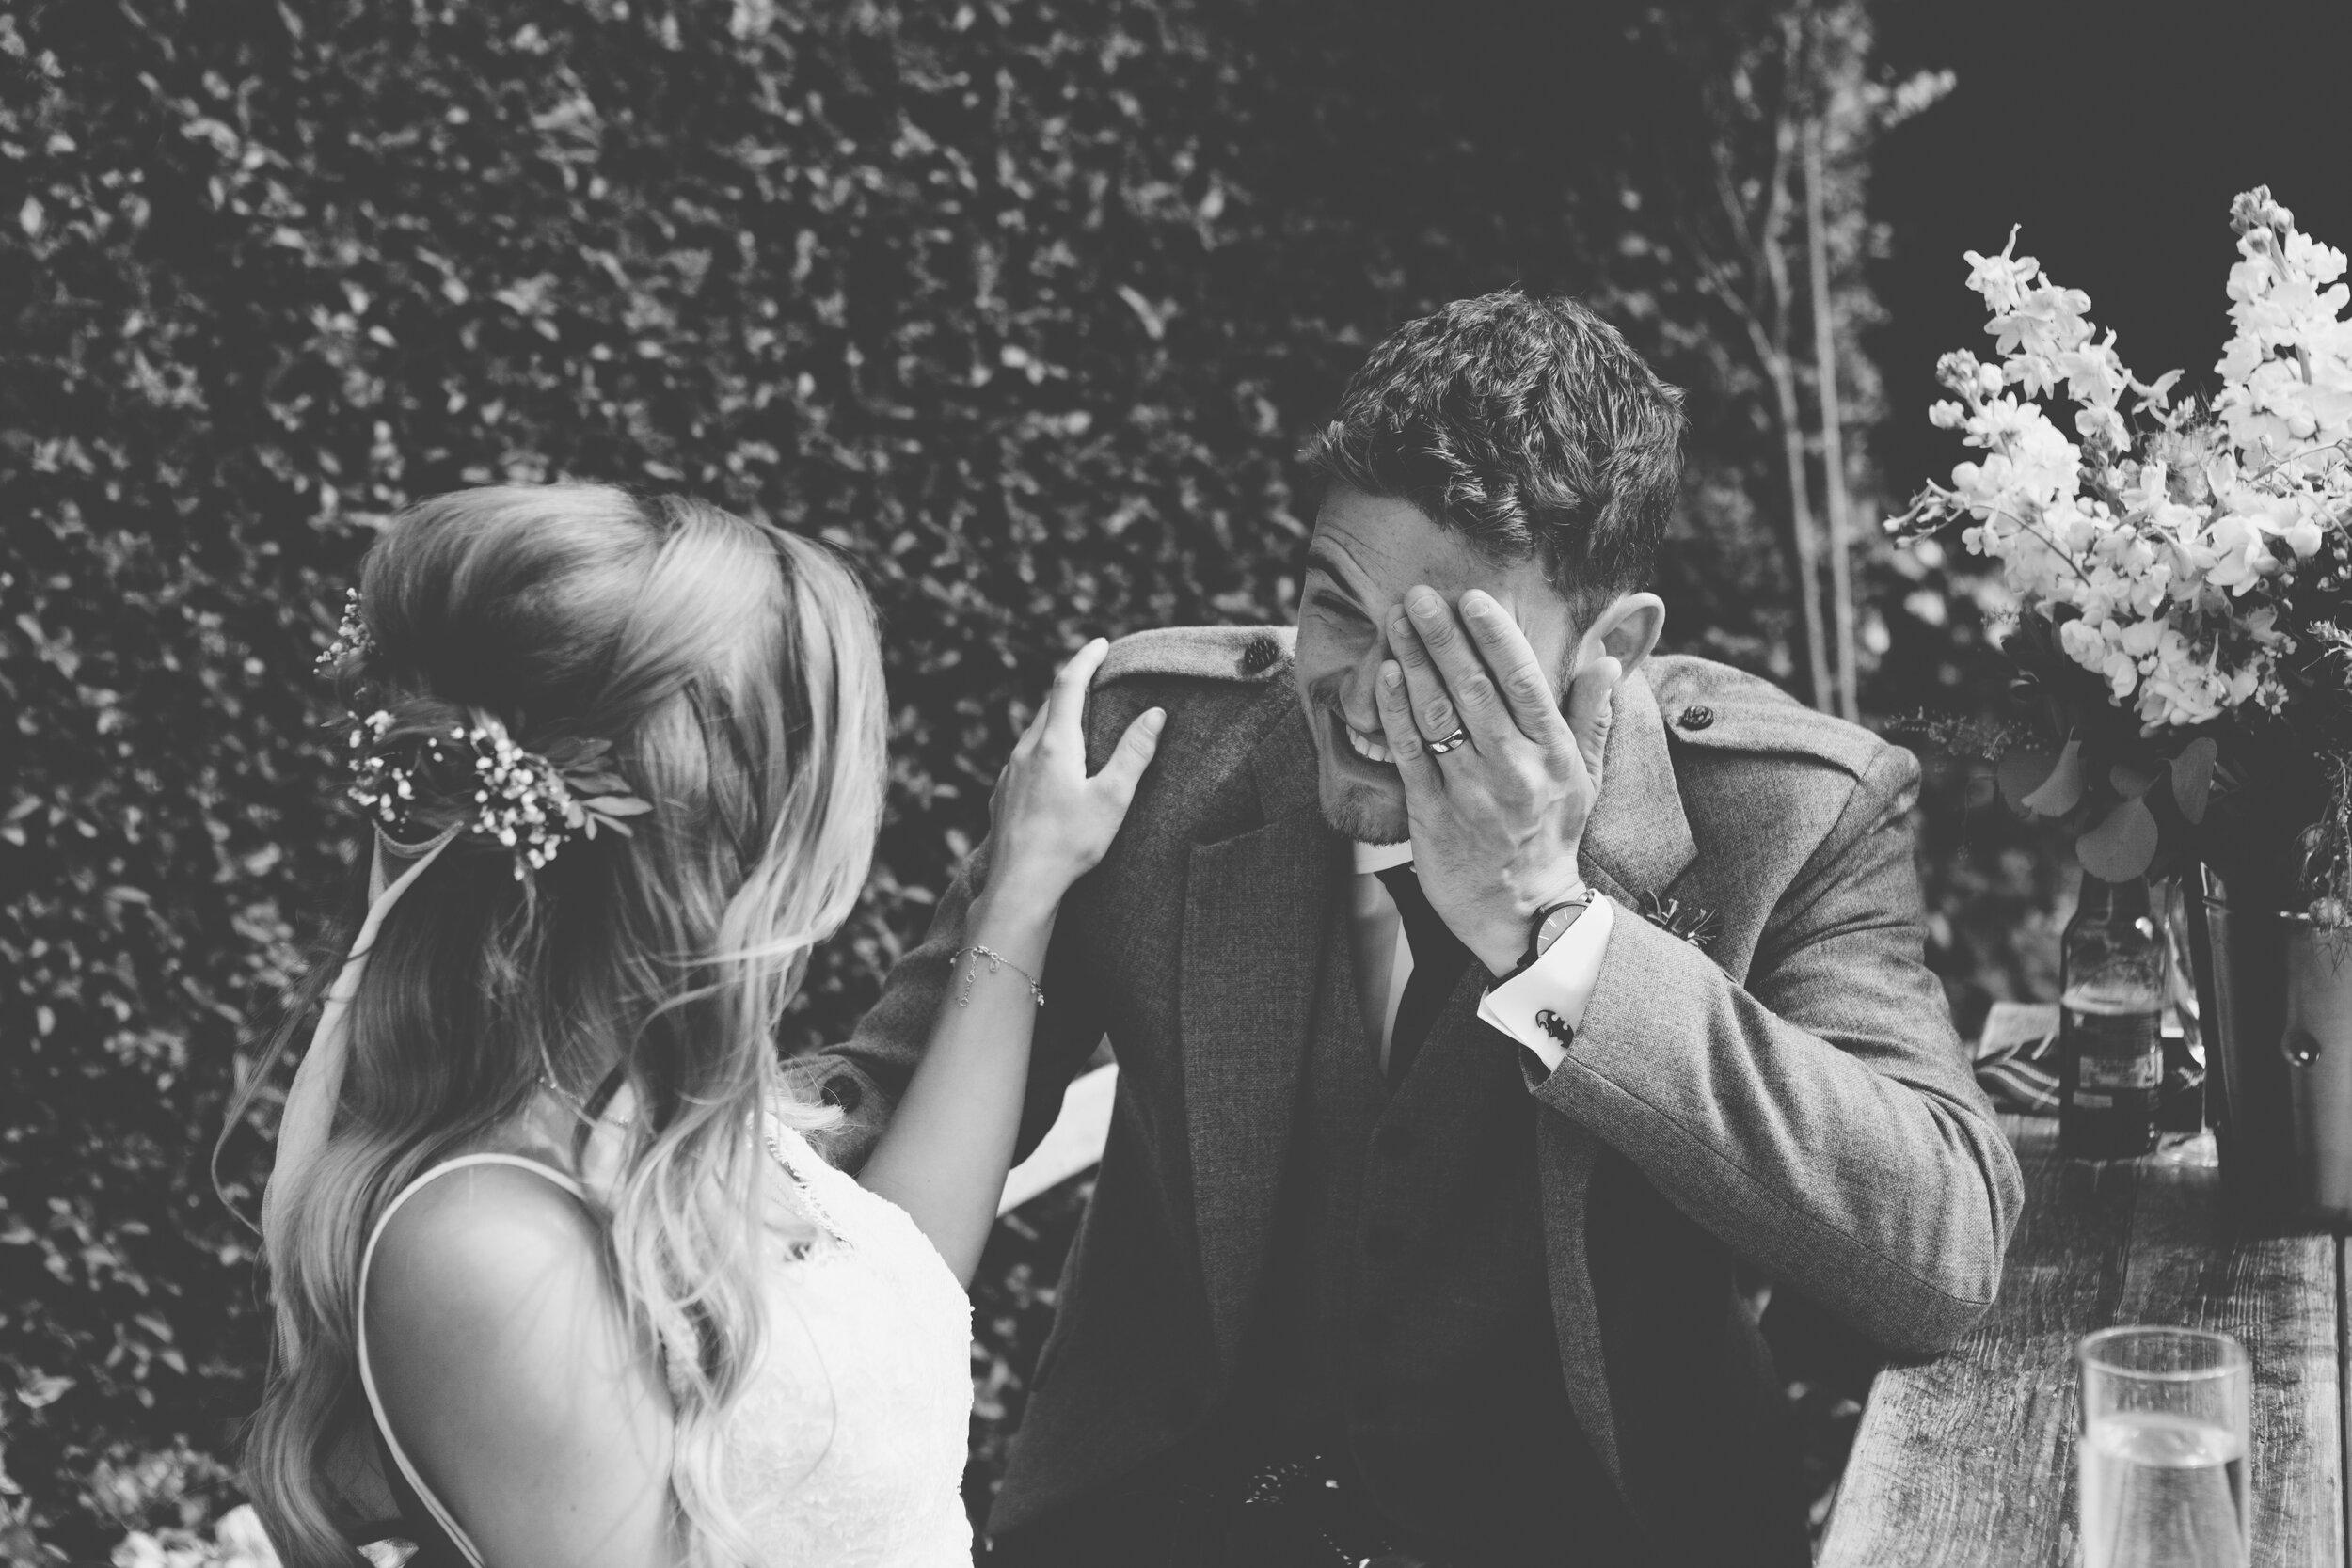 Dalduff Farm Ayrshire Wedding Photography - Claire Basiuk Photographer - 10.jpg